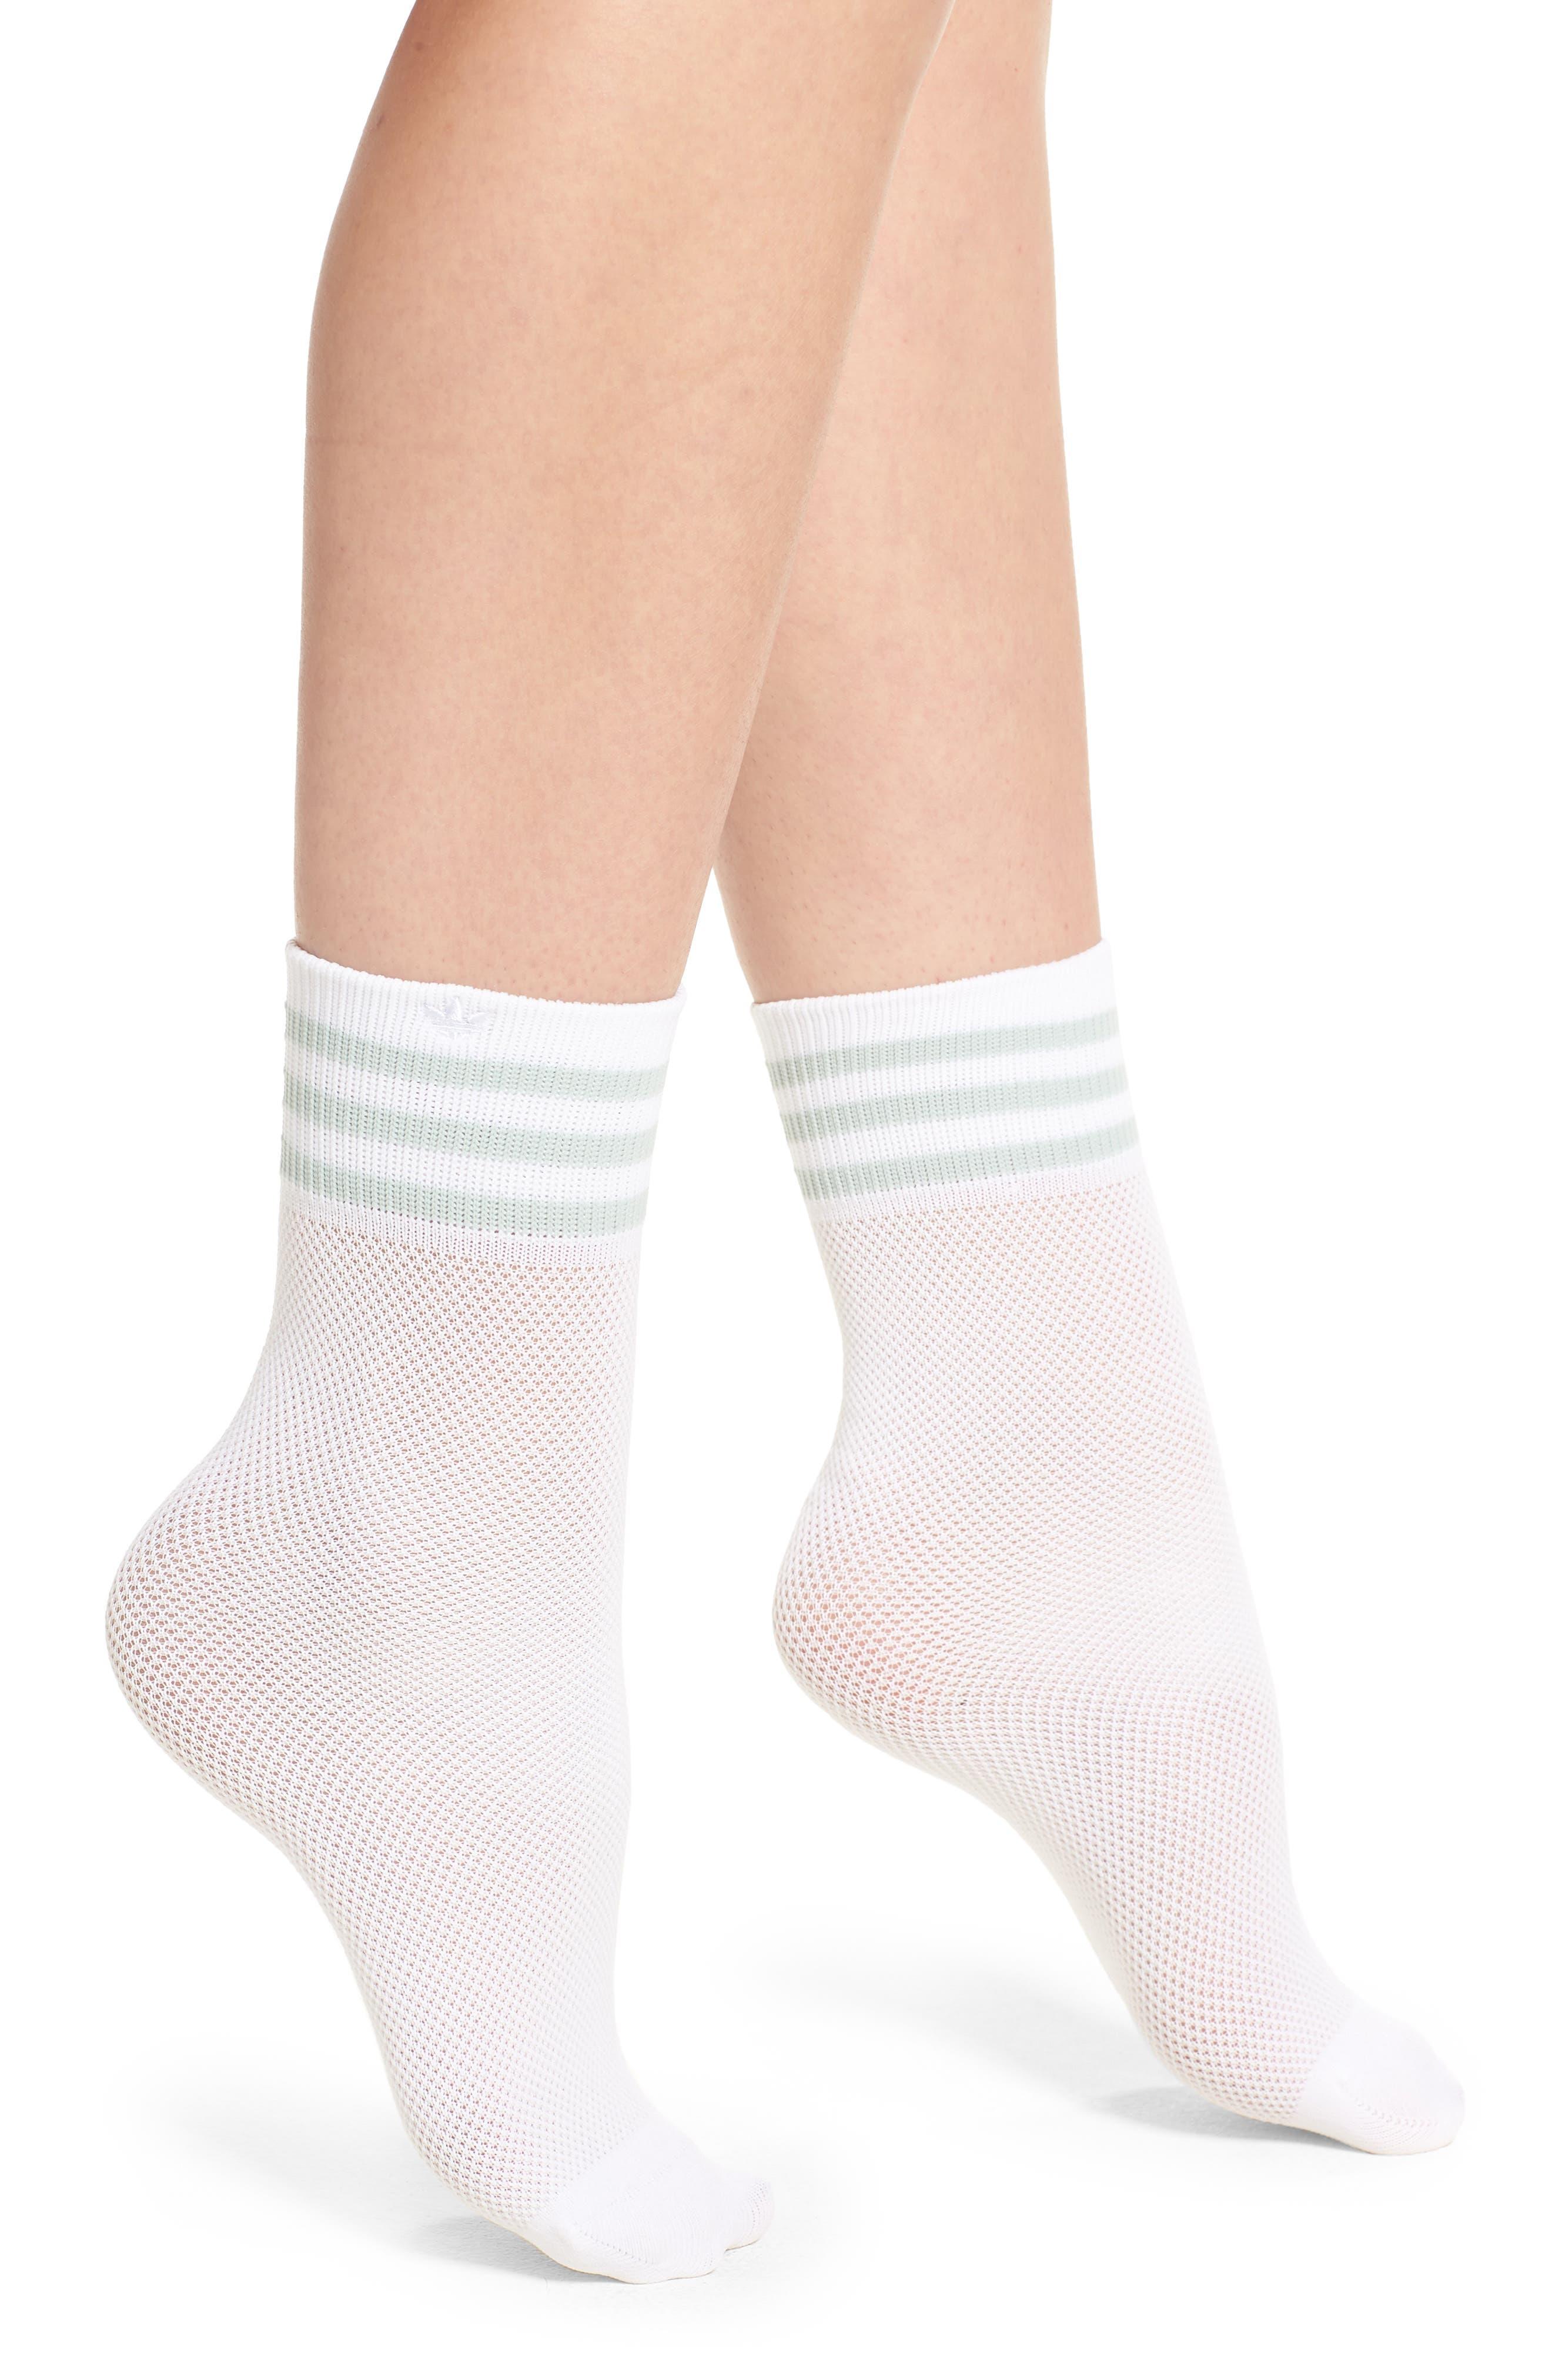 Stripe Mesh Ankle Socks,                             Main thumbnail 1, color,                             White/ Ash Green